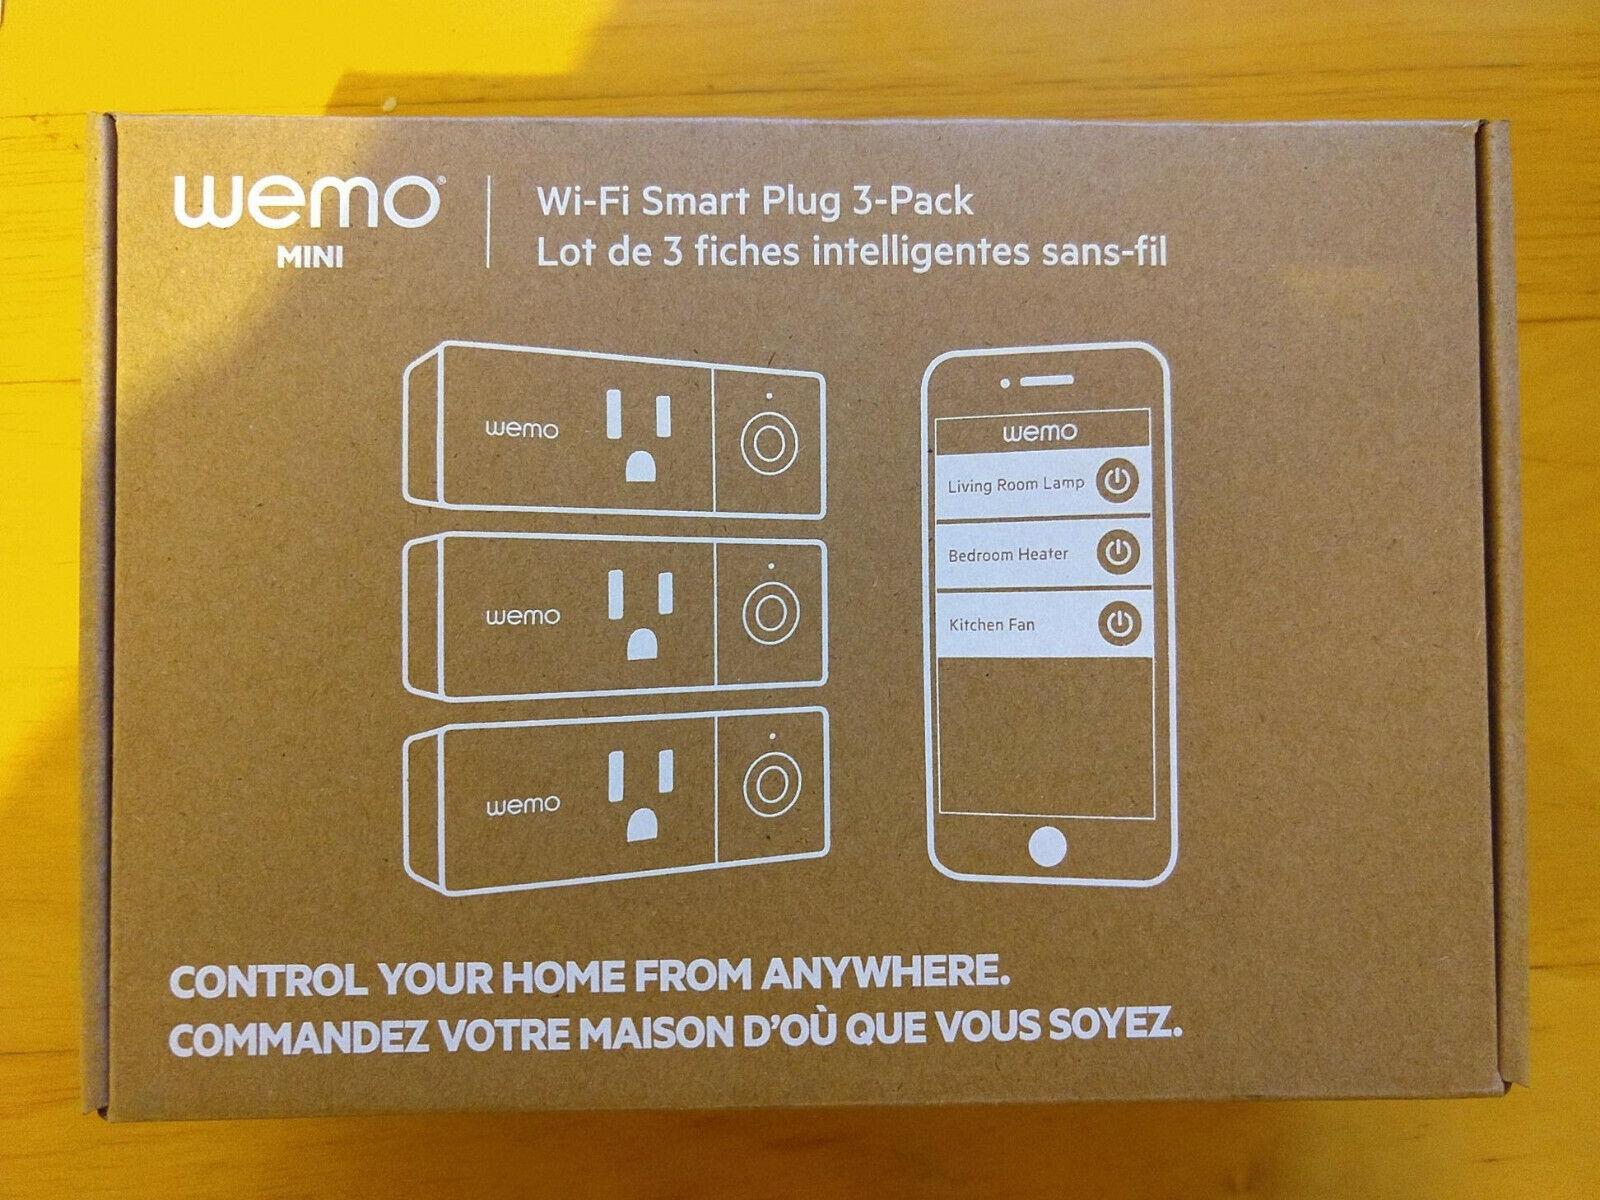 **NEW ** WeMo F7C063-BDL Wi-Fi Smart Plug Bundle